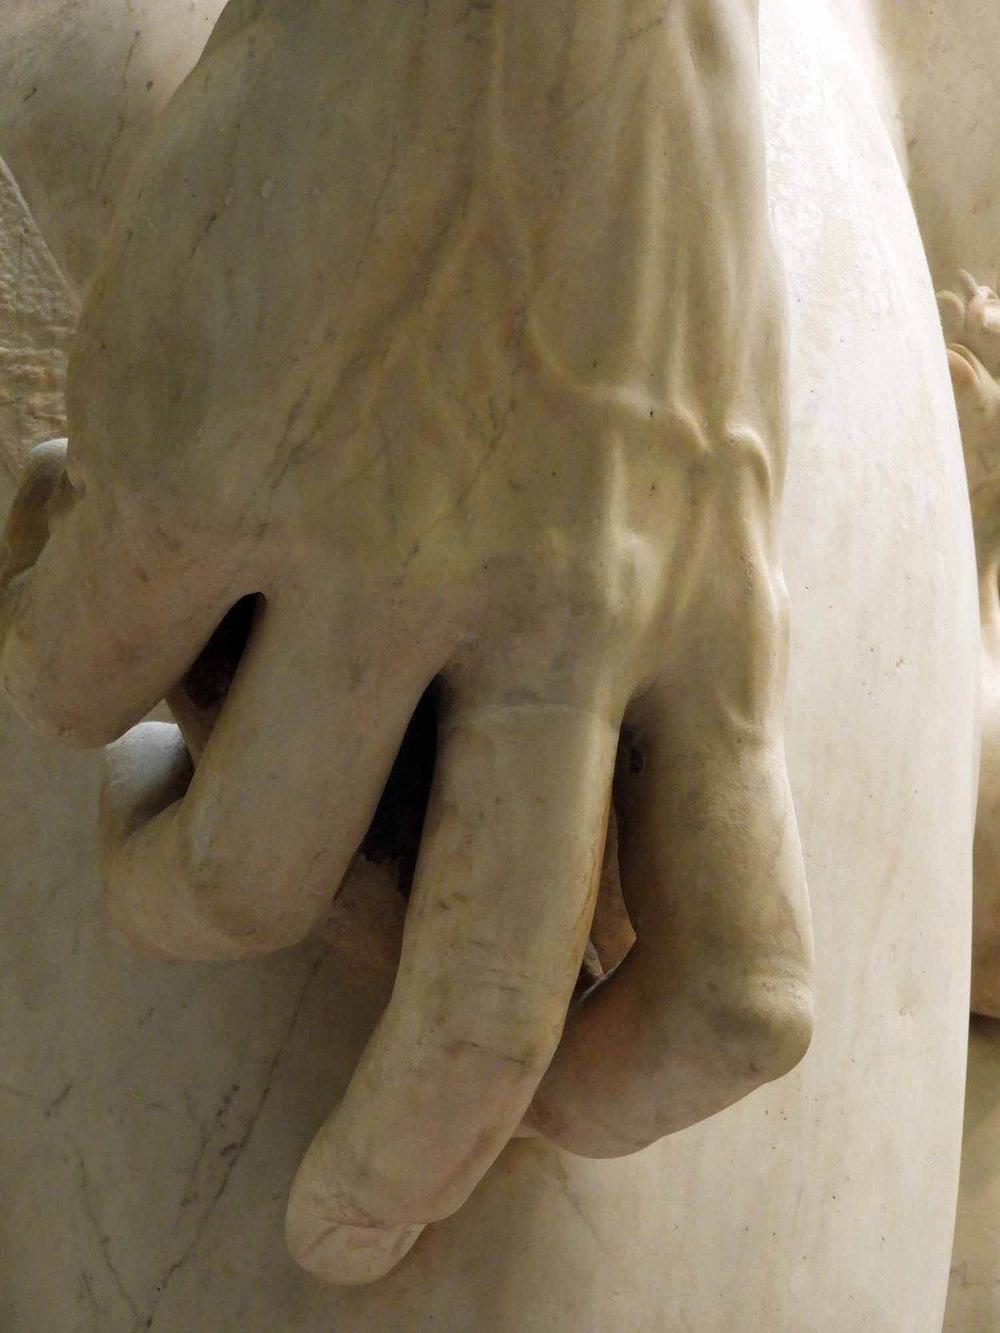 italy-italia-florence-galeria-da-academia-david-statue-hand-detail-veins.JPG